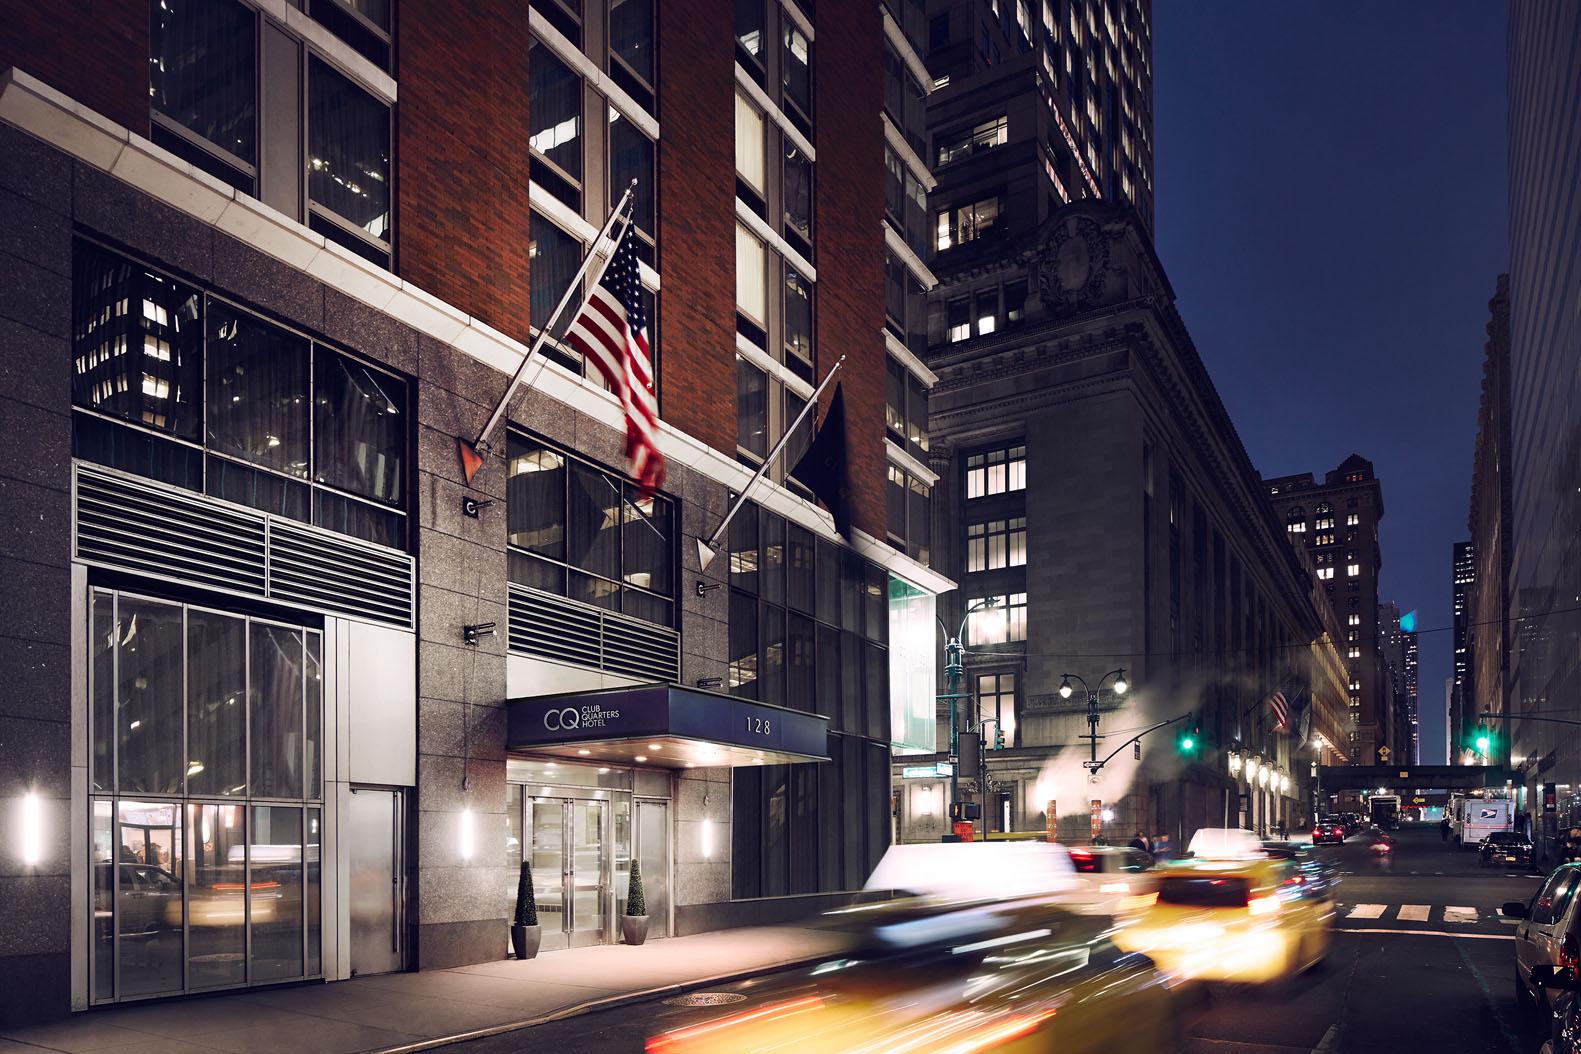 Member - Club Quarters Hotels